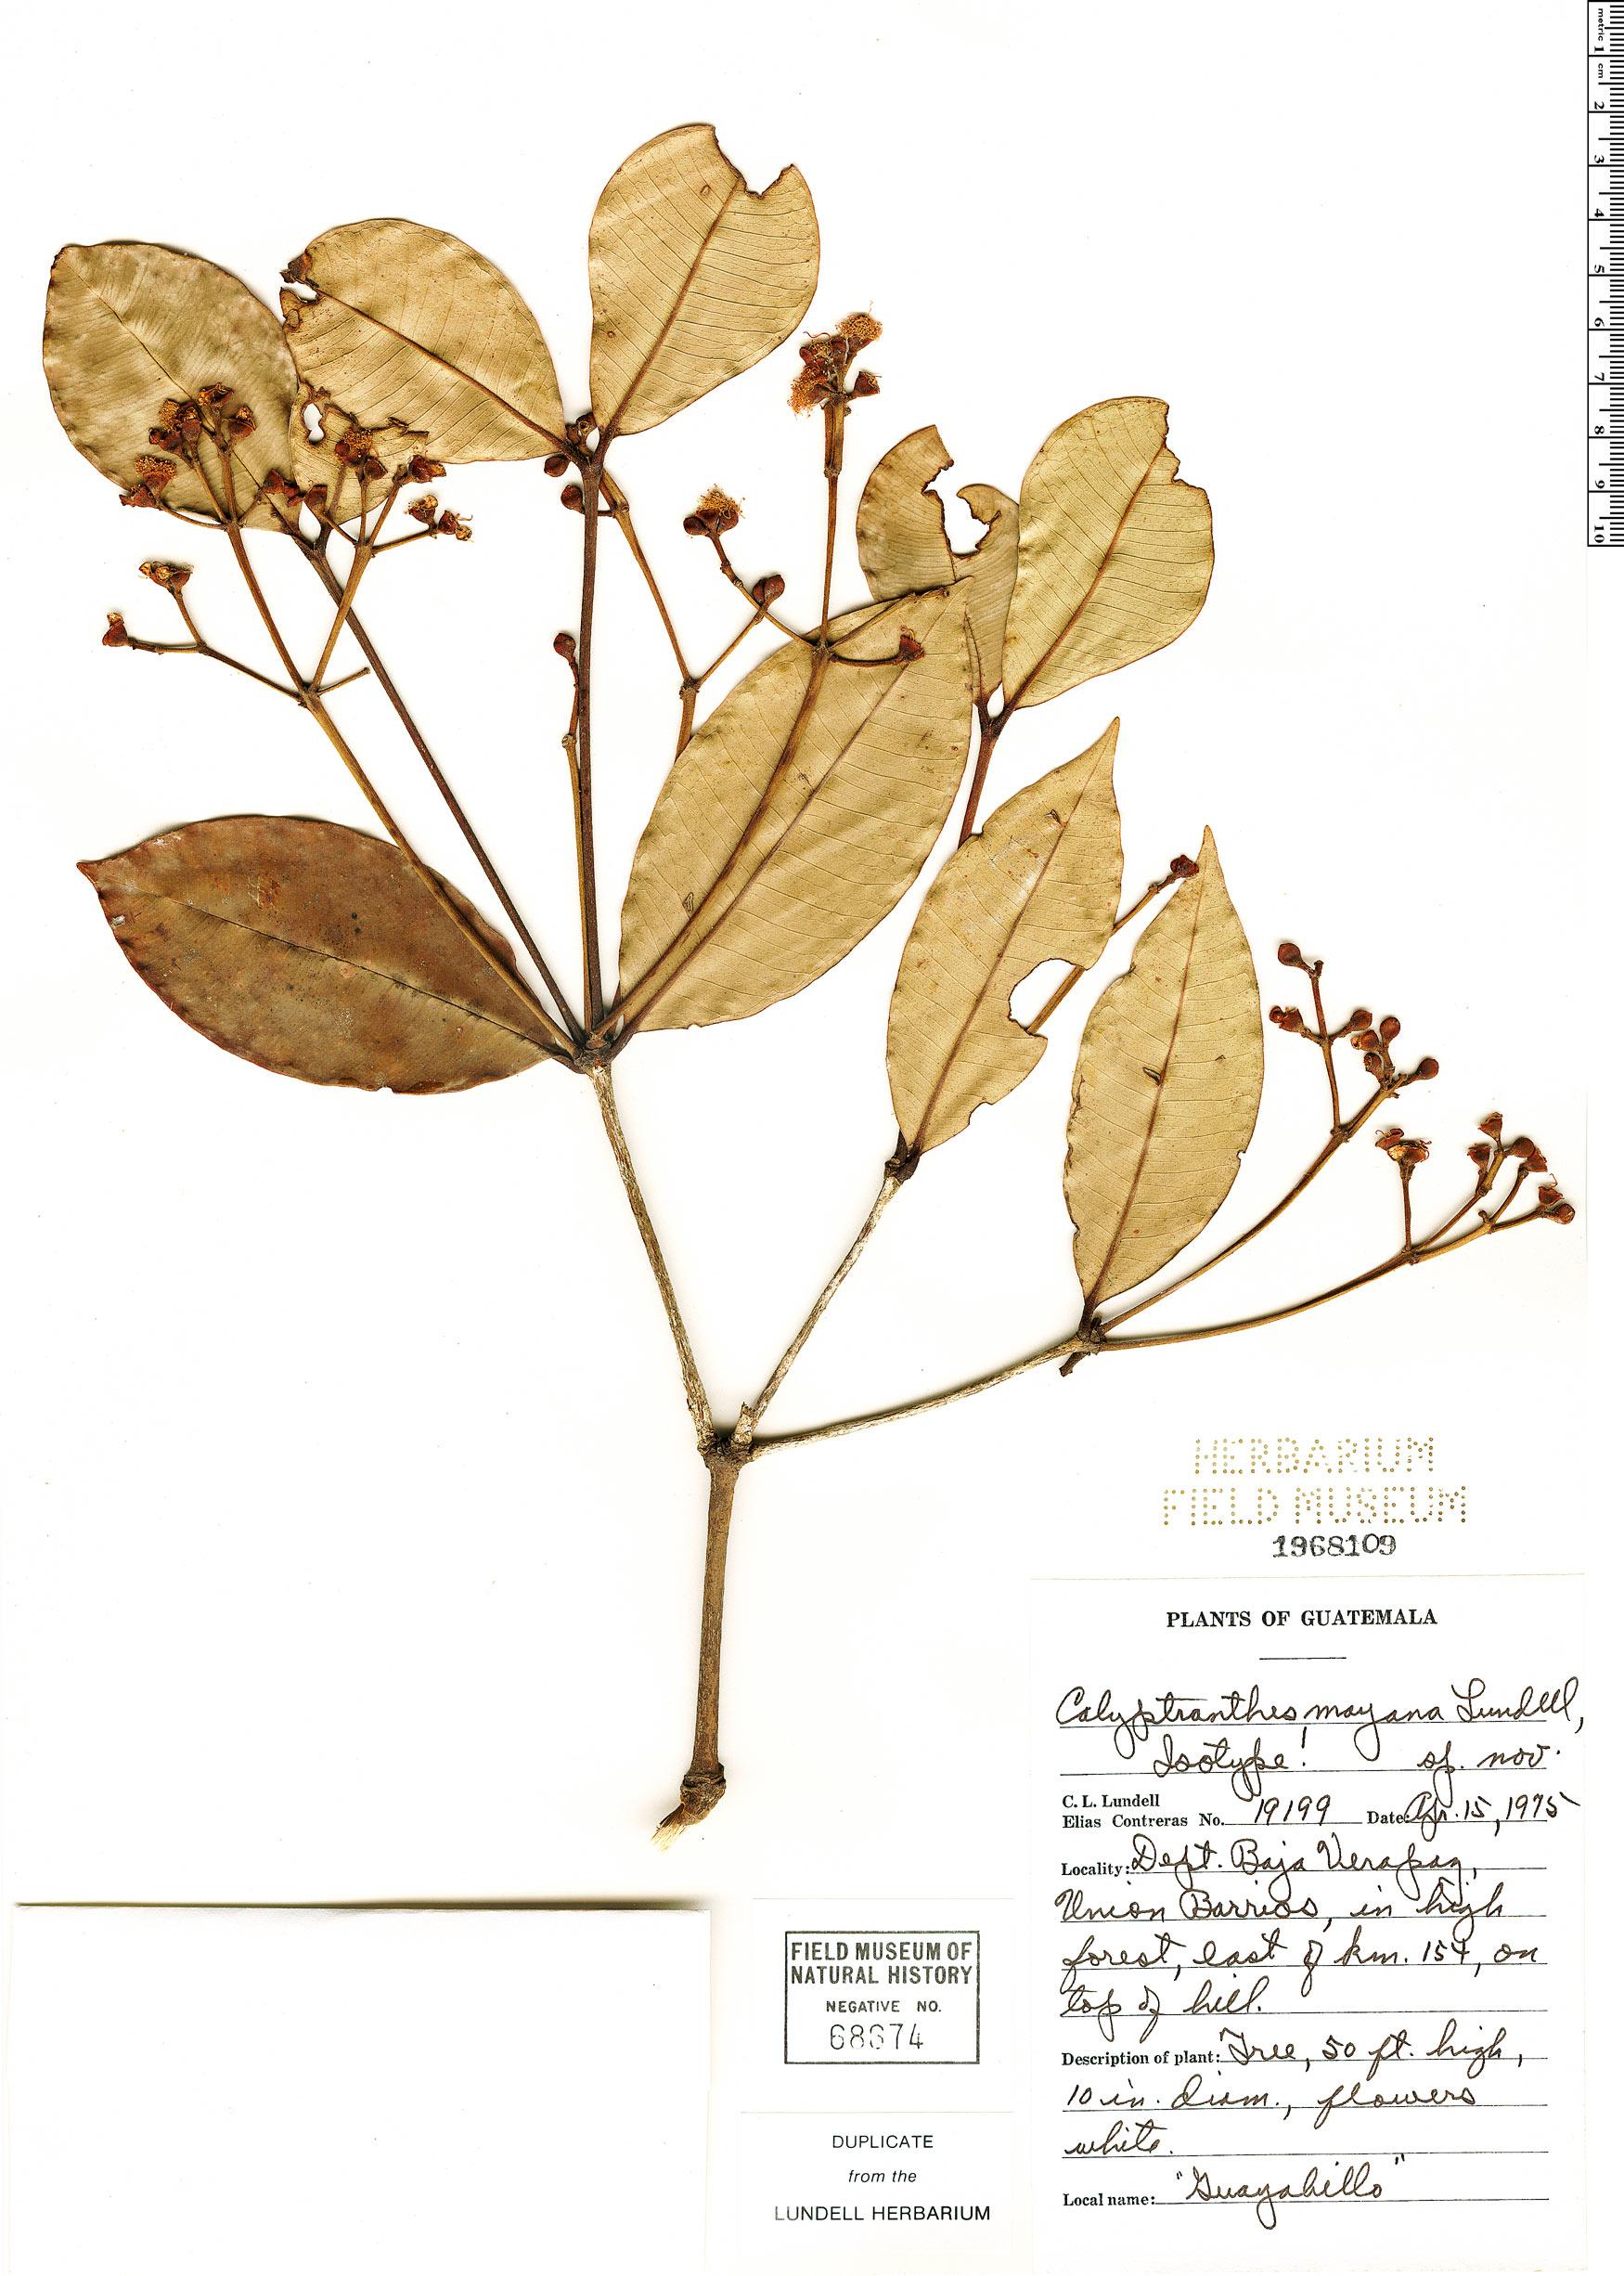 Specimen: Calyptranthes mayana